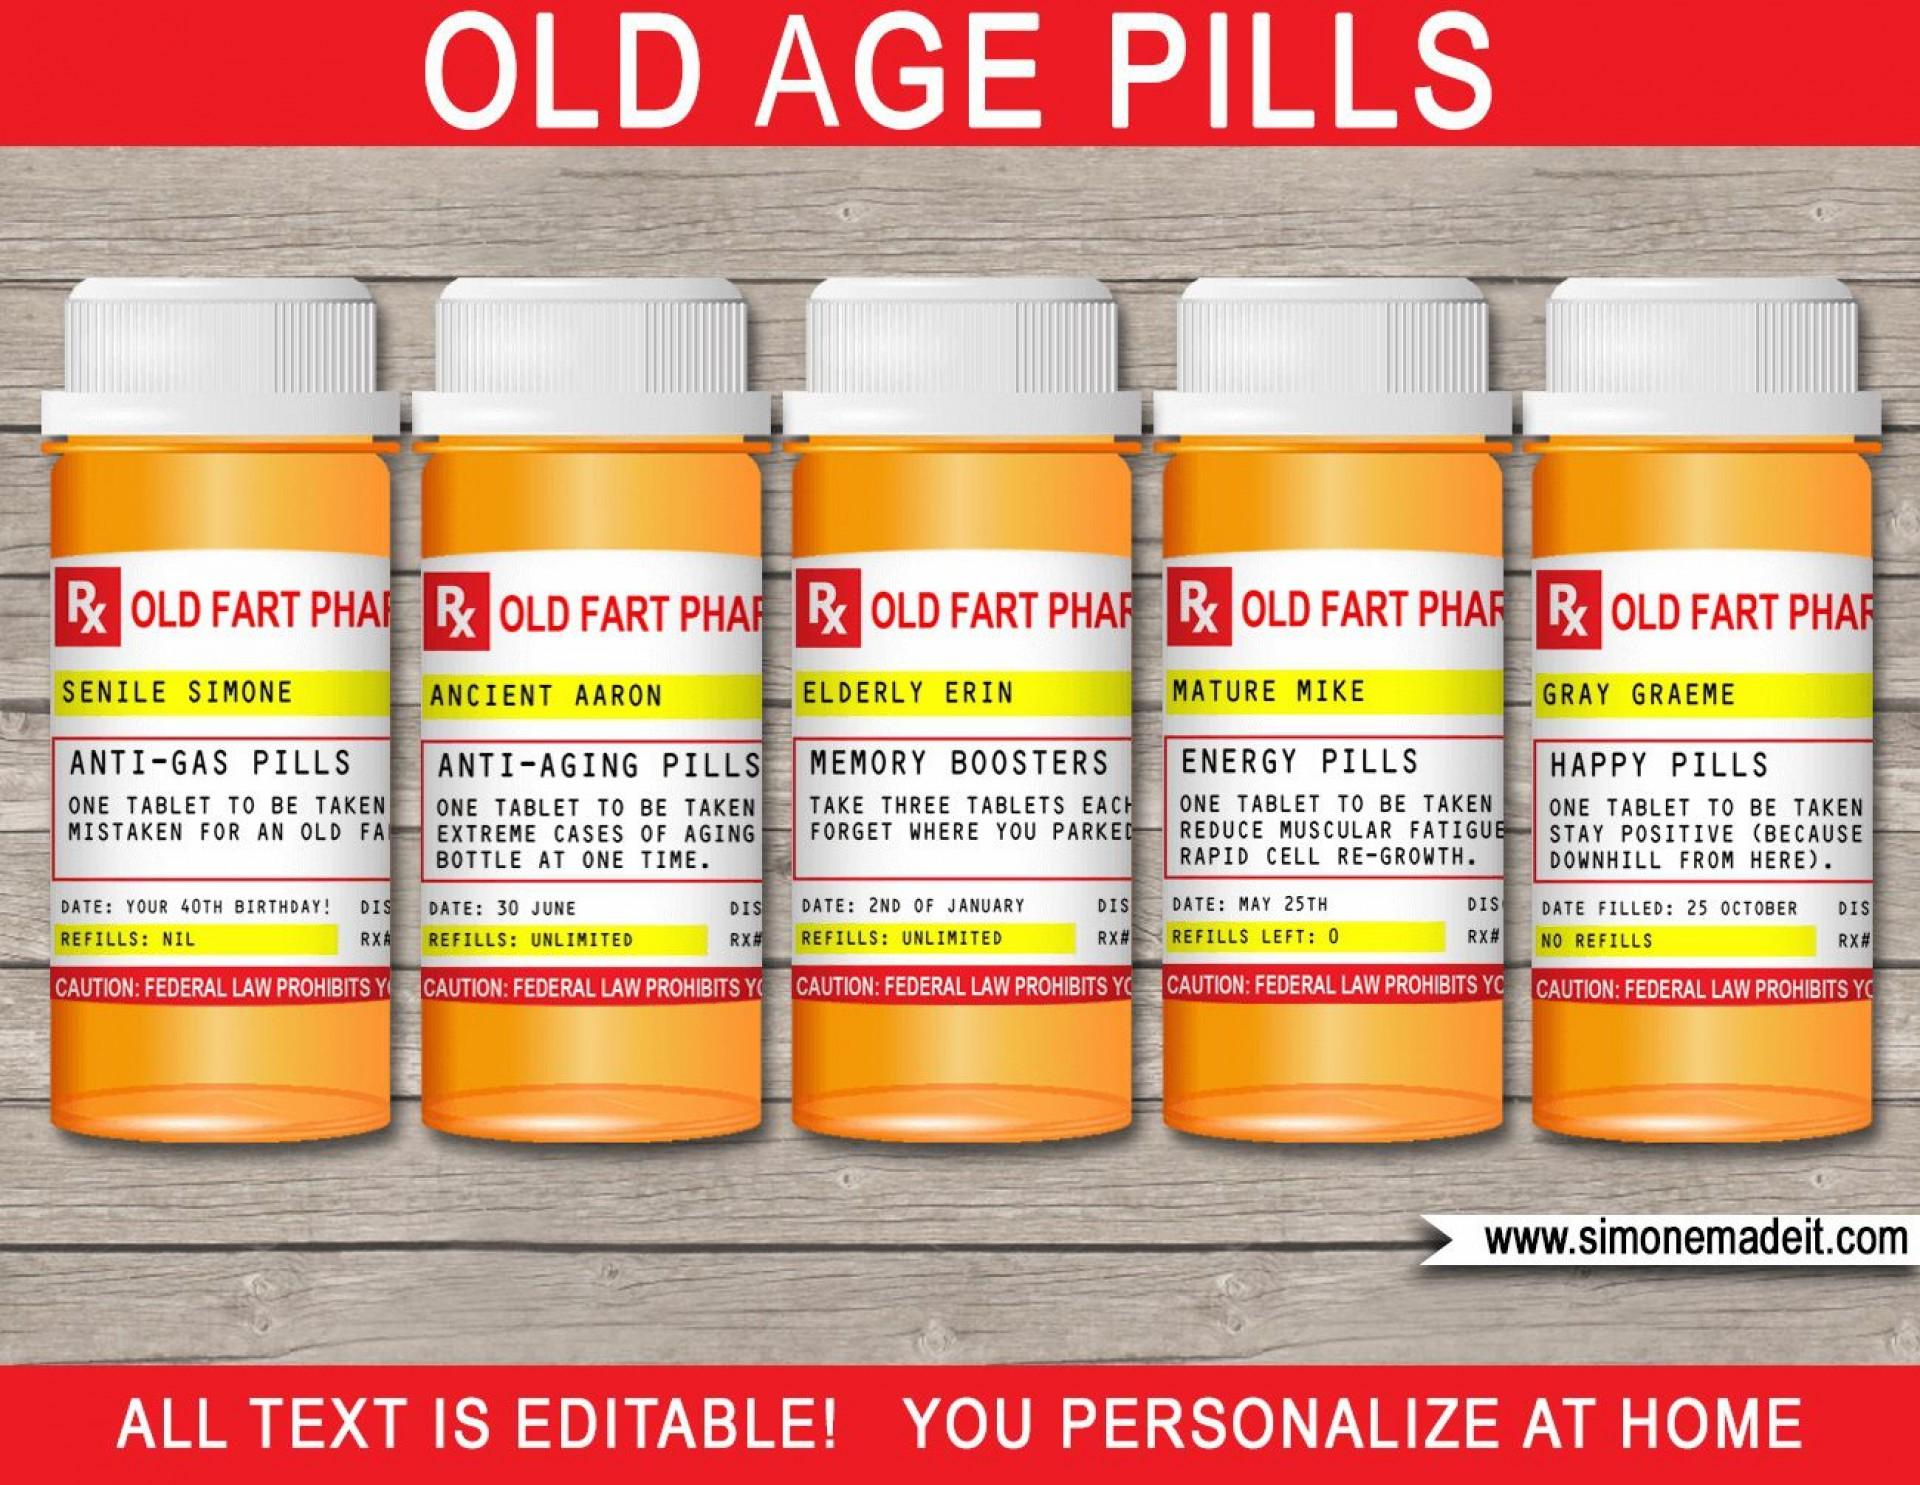 001 Astounding Pill Bottle Label Template High Def  Vintage Medicine Printable Free1920